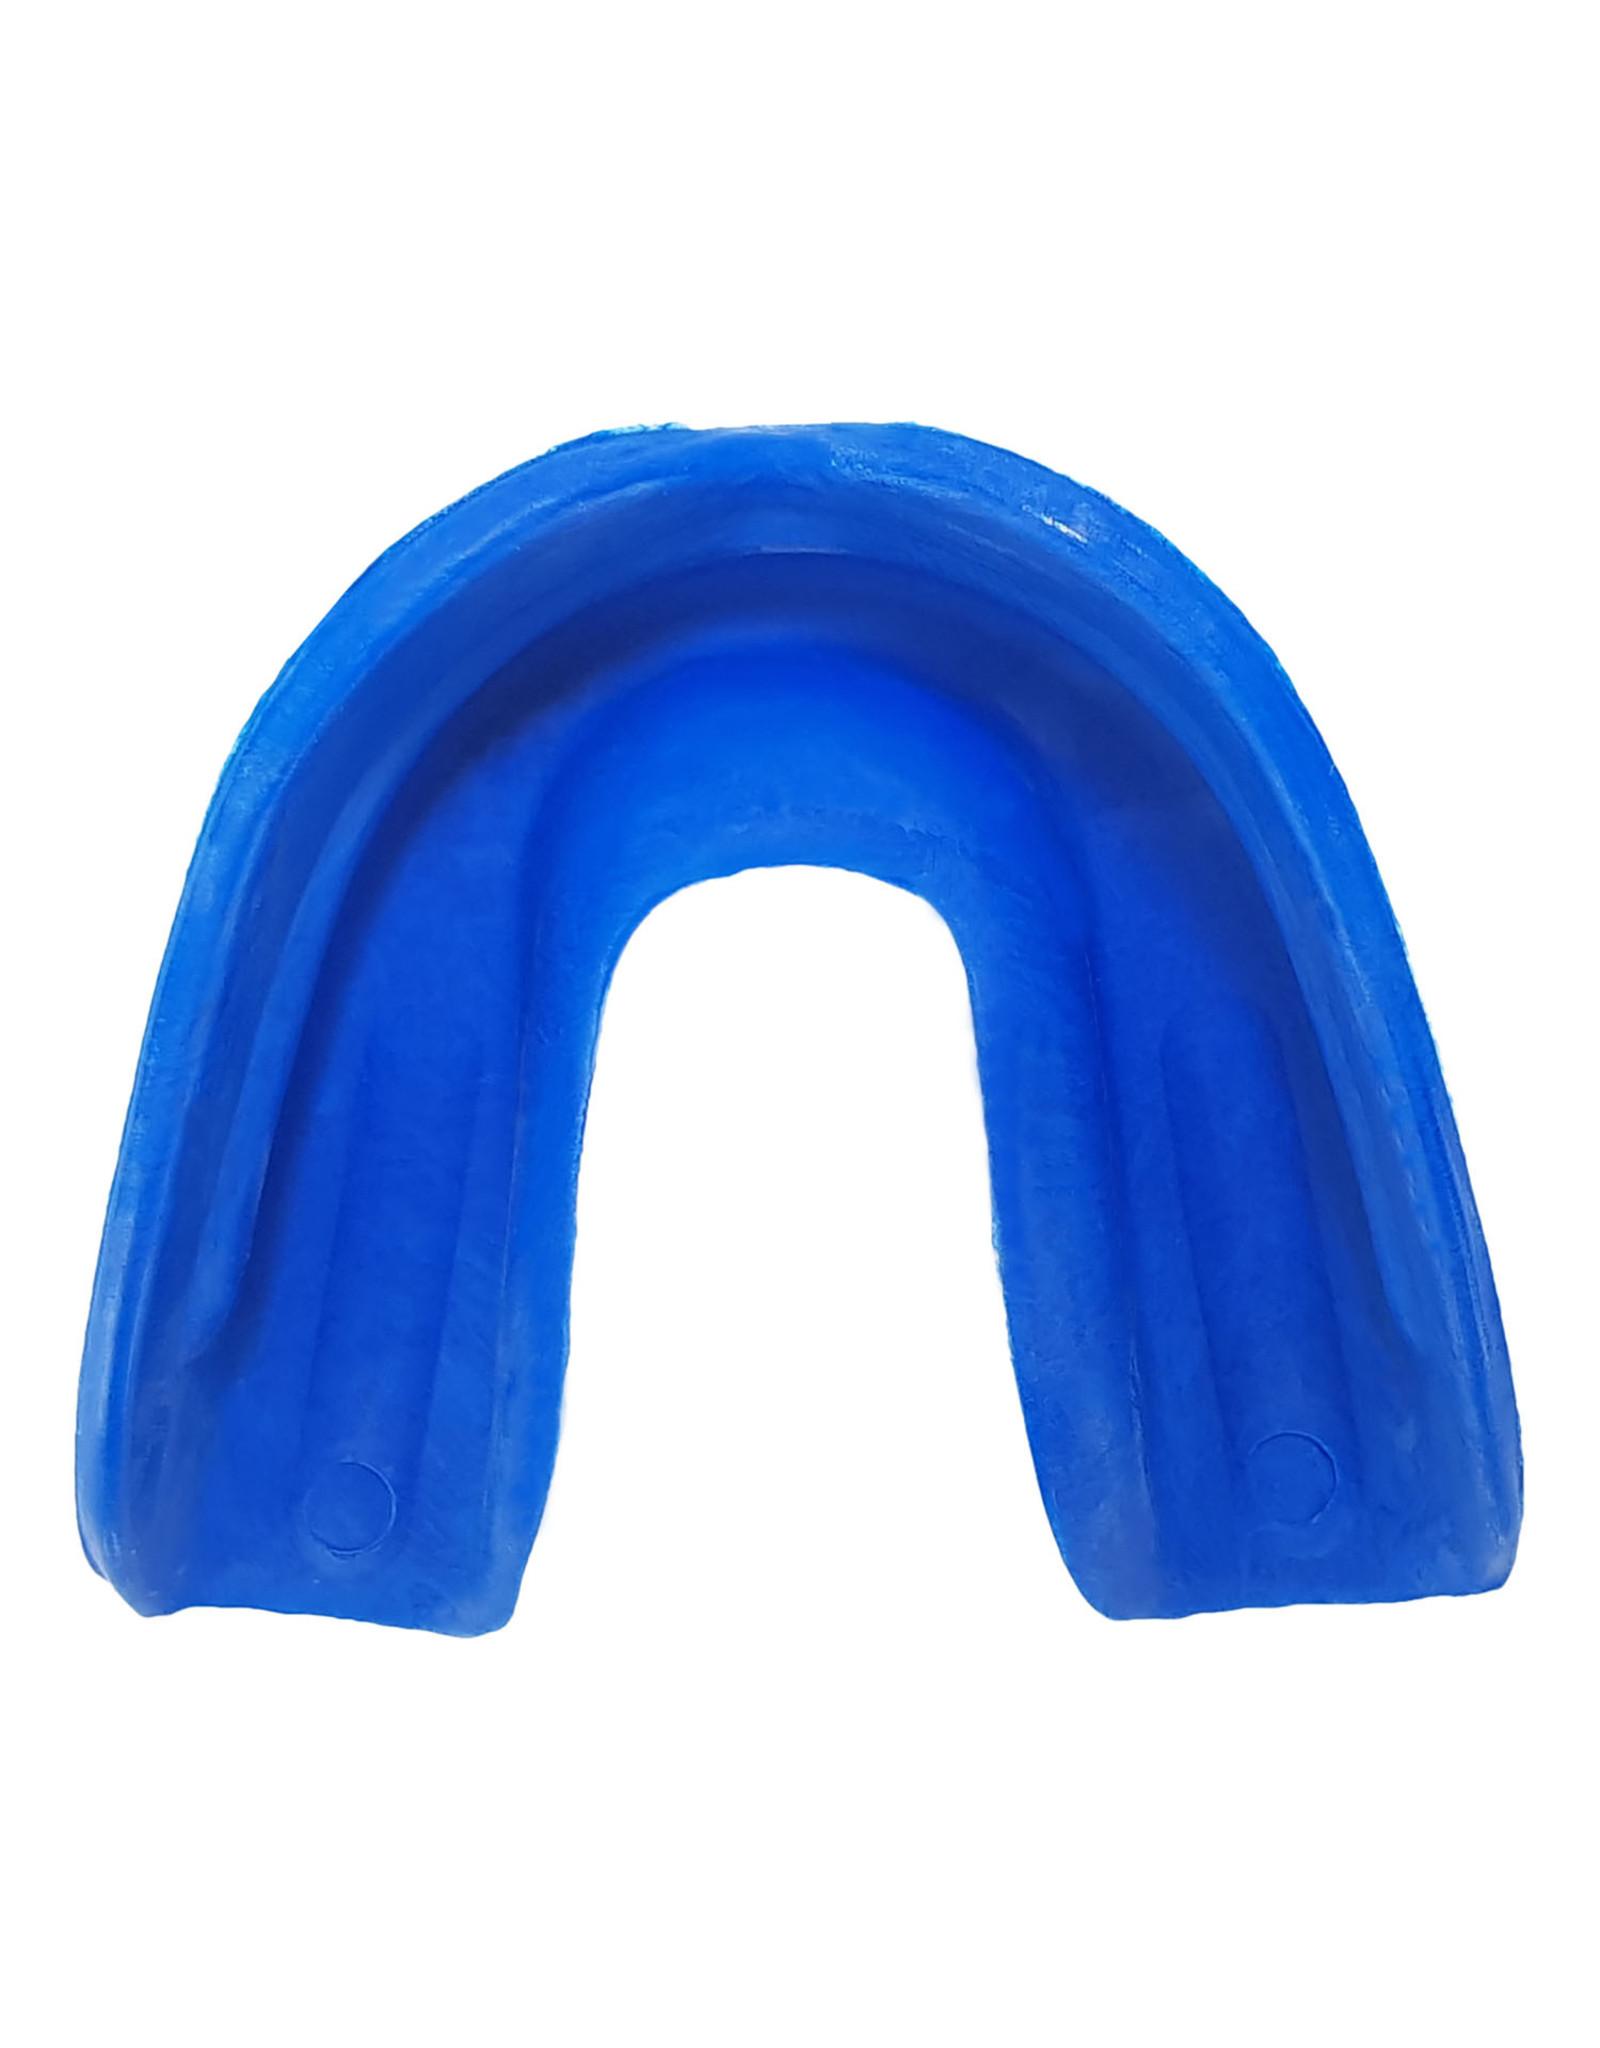 Bruce Lee Bruce Lee Mouthguard Blue (no blister)